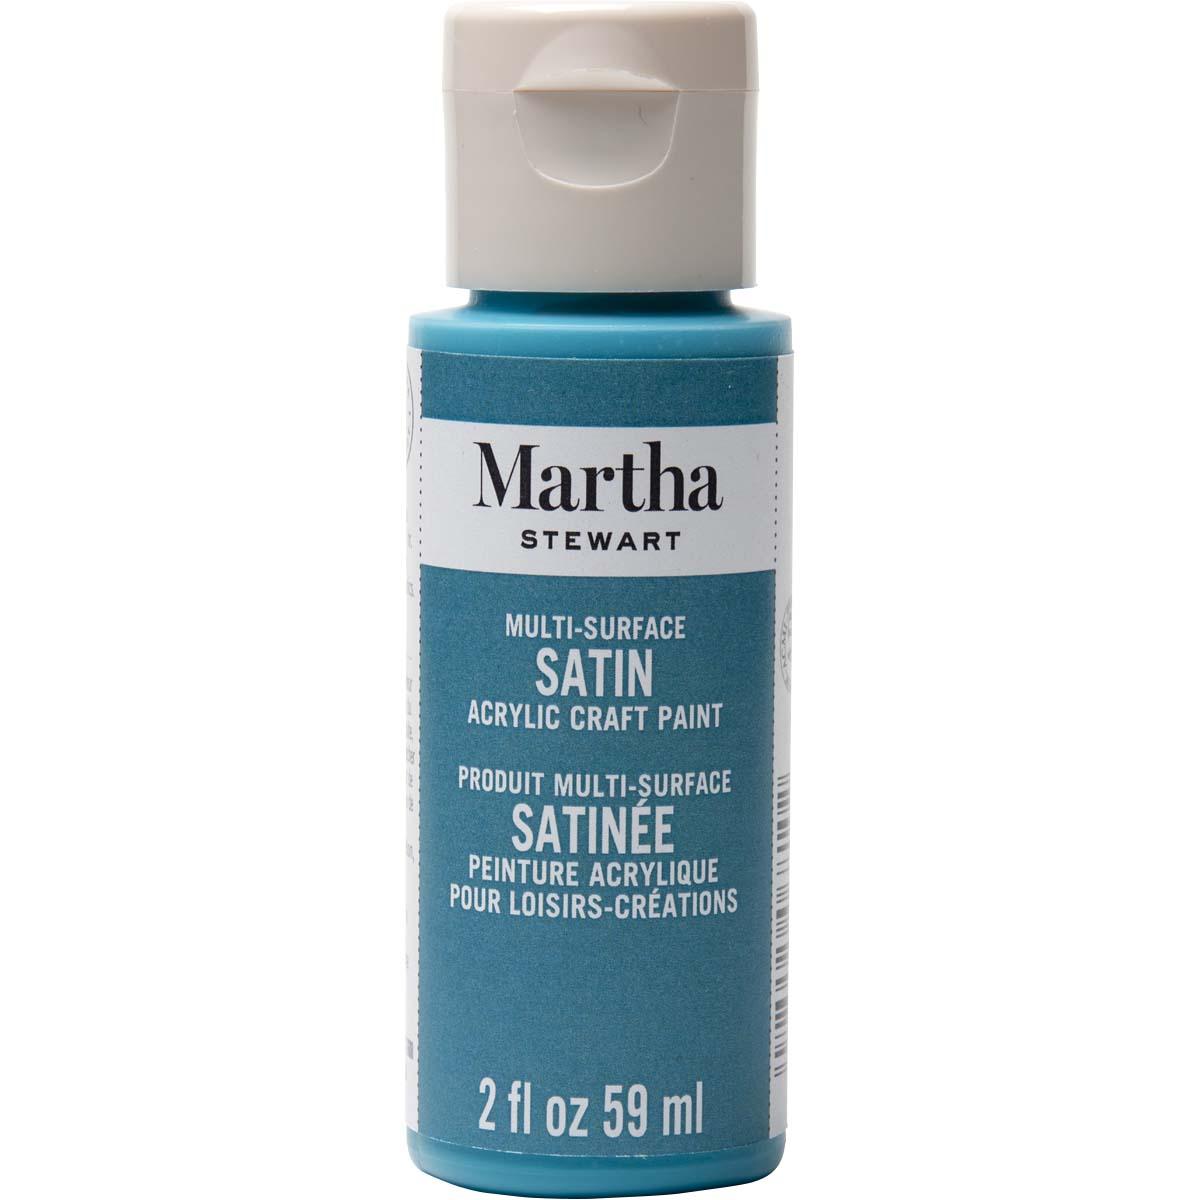 Martha Stewart ® Multi-Surface Satin Acrylic Craft Paint - Peacock Feather, 2 oz.